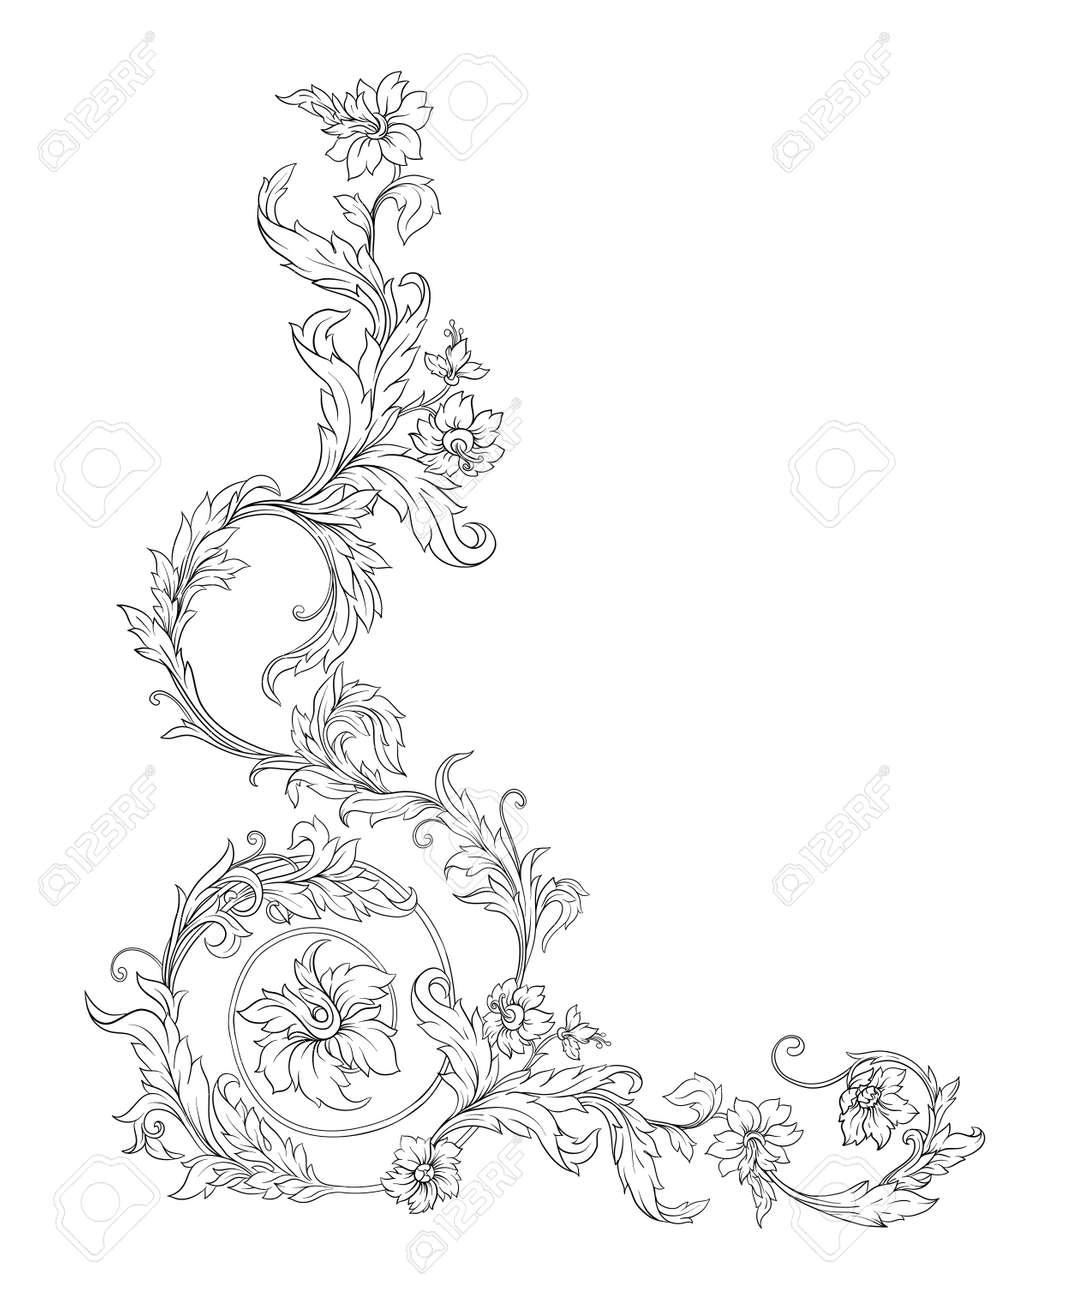 Elements In baroque, rococo, victorian renaissance style. Trendy floral vintage pattern. Vector illustration - 133825431